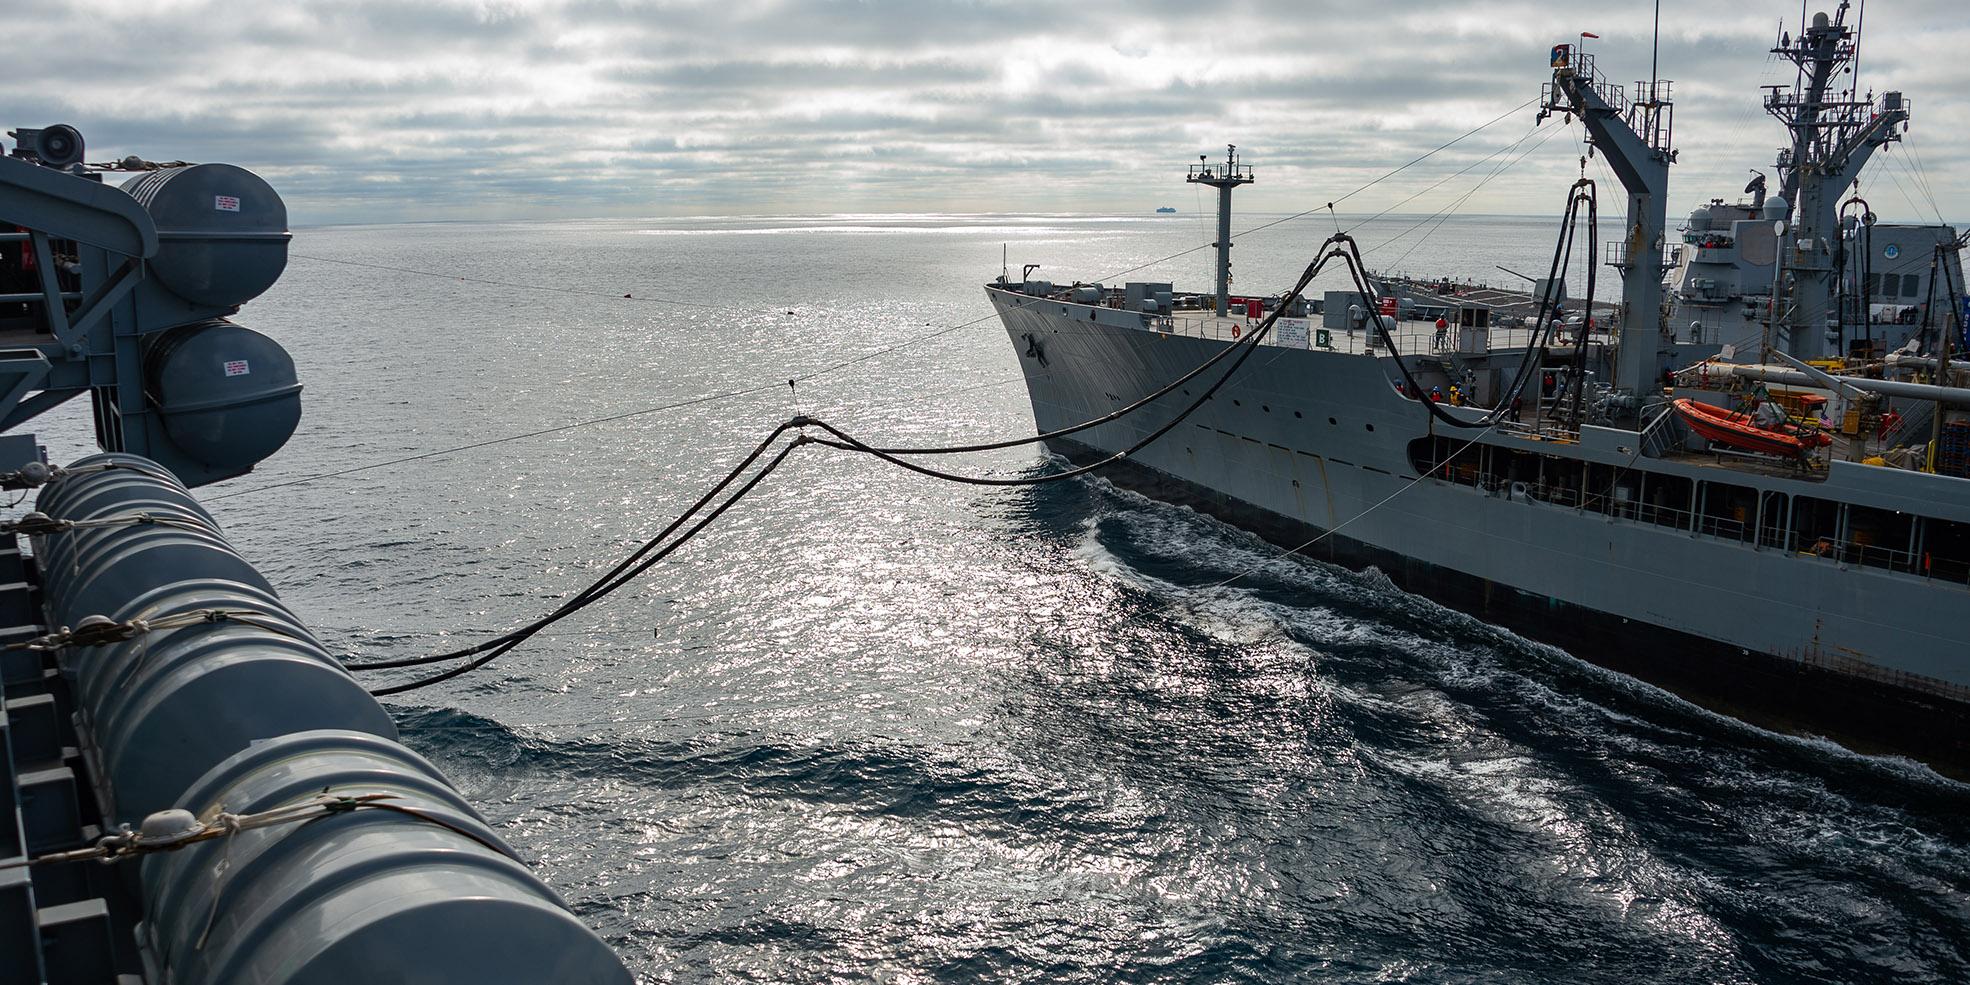 USS Carl Vinson (CVN 70) conducts a replenishment-at-sea with Henry J. Kaiser-class fleet replenishment oiler USNS John Lenthall (T-AO 189).